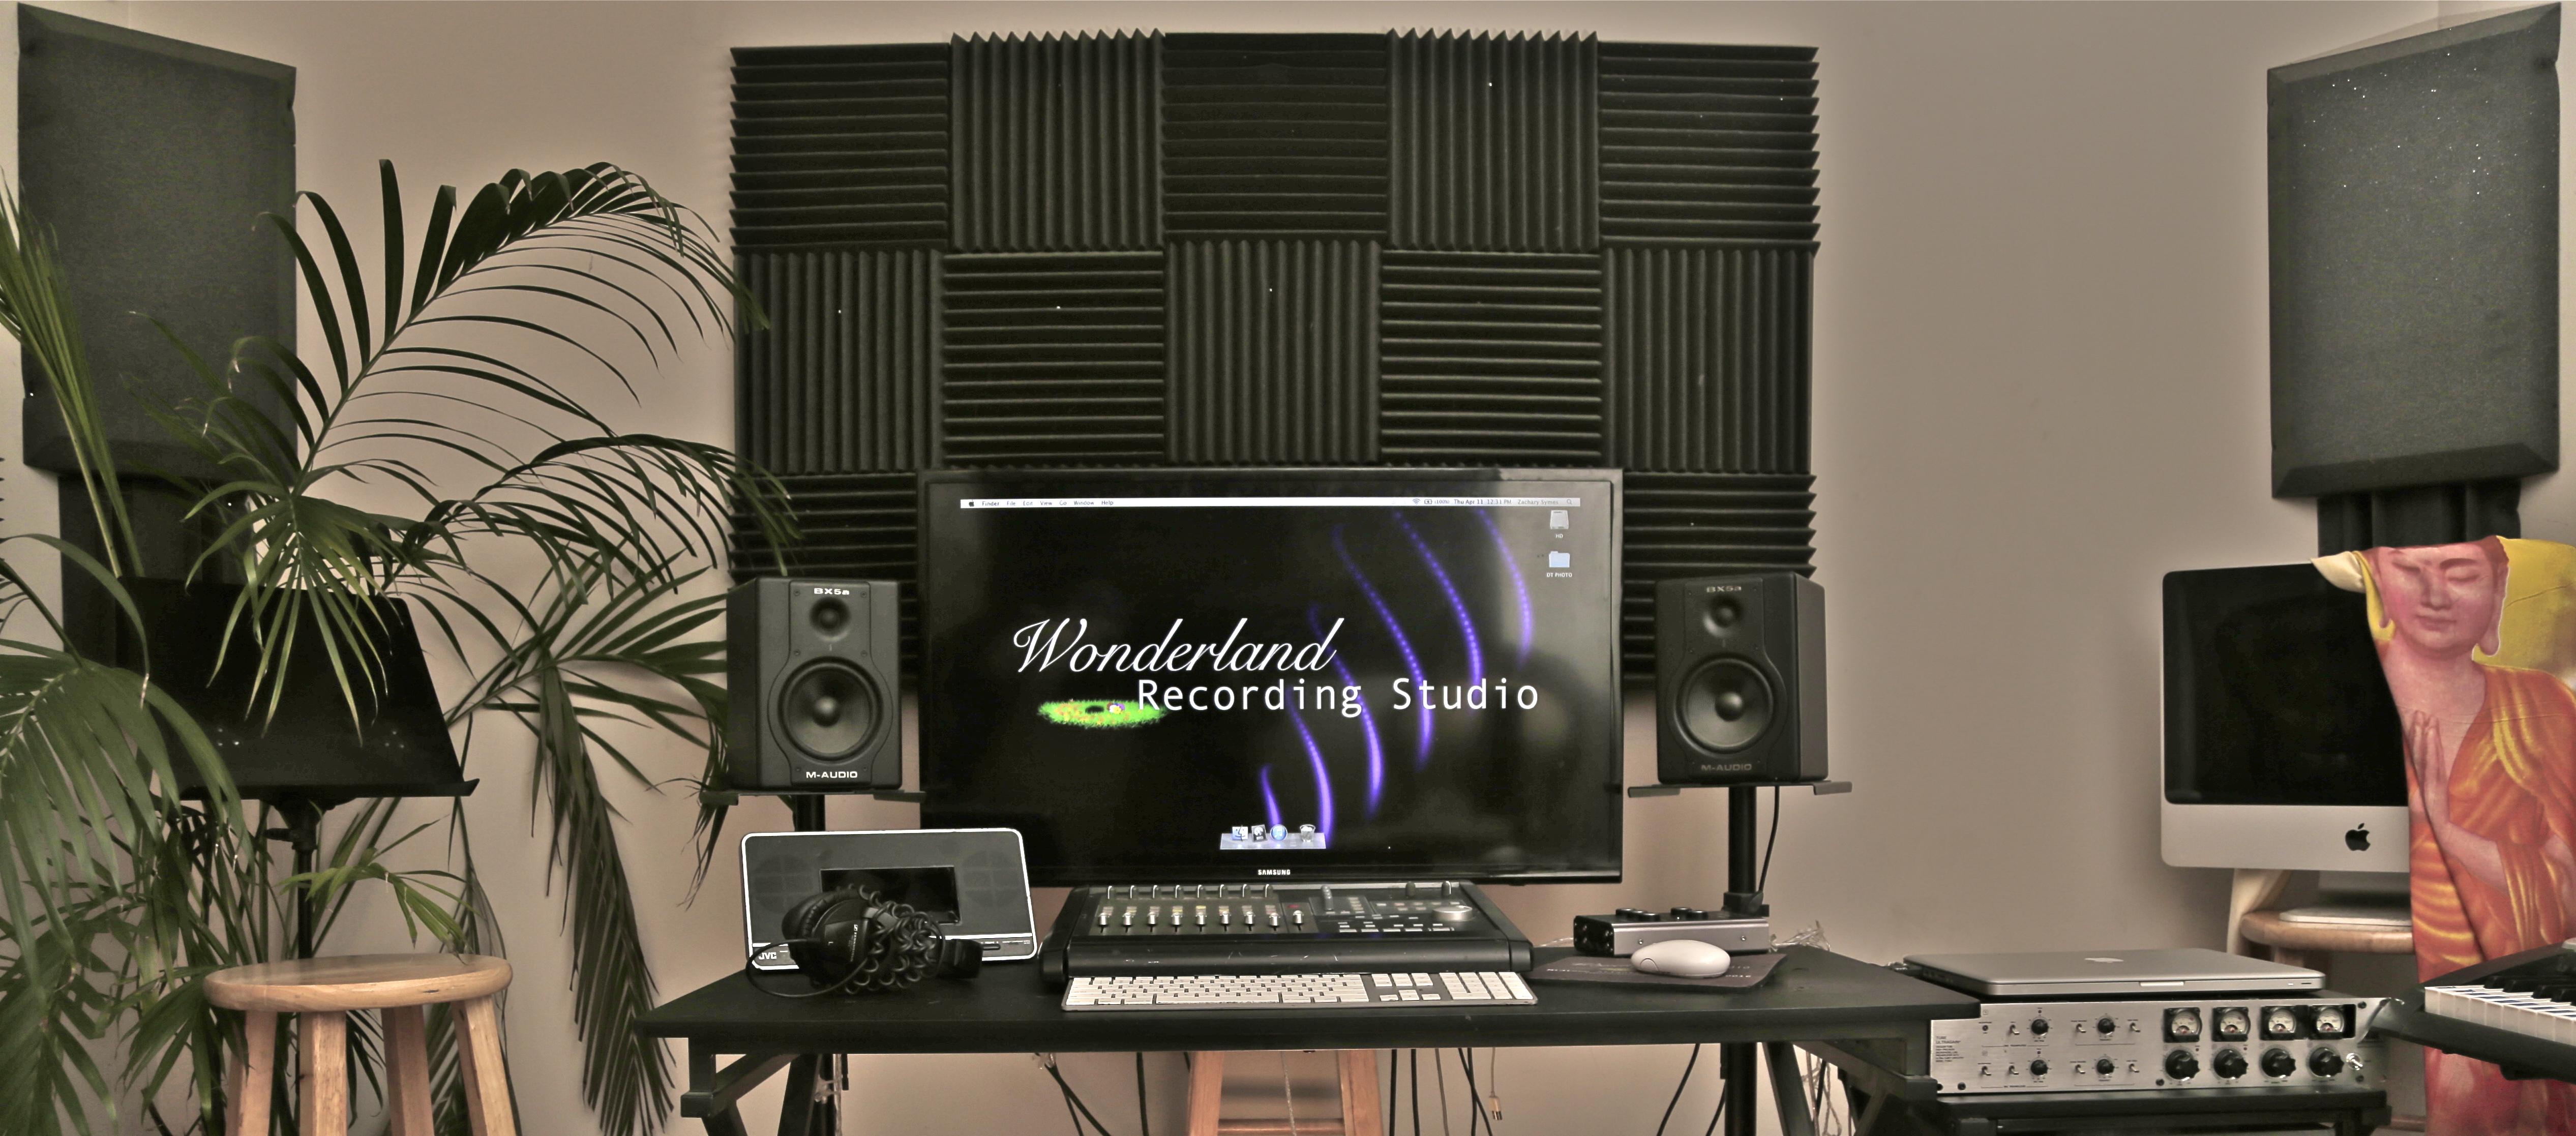 Wonderland Control Room